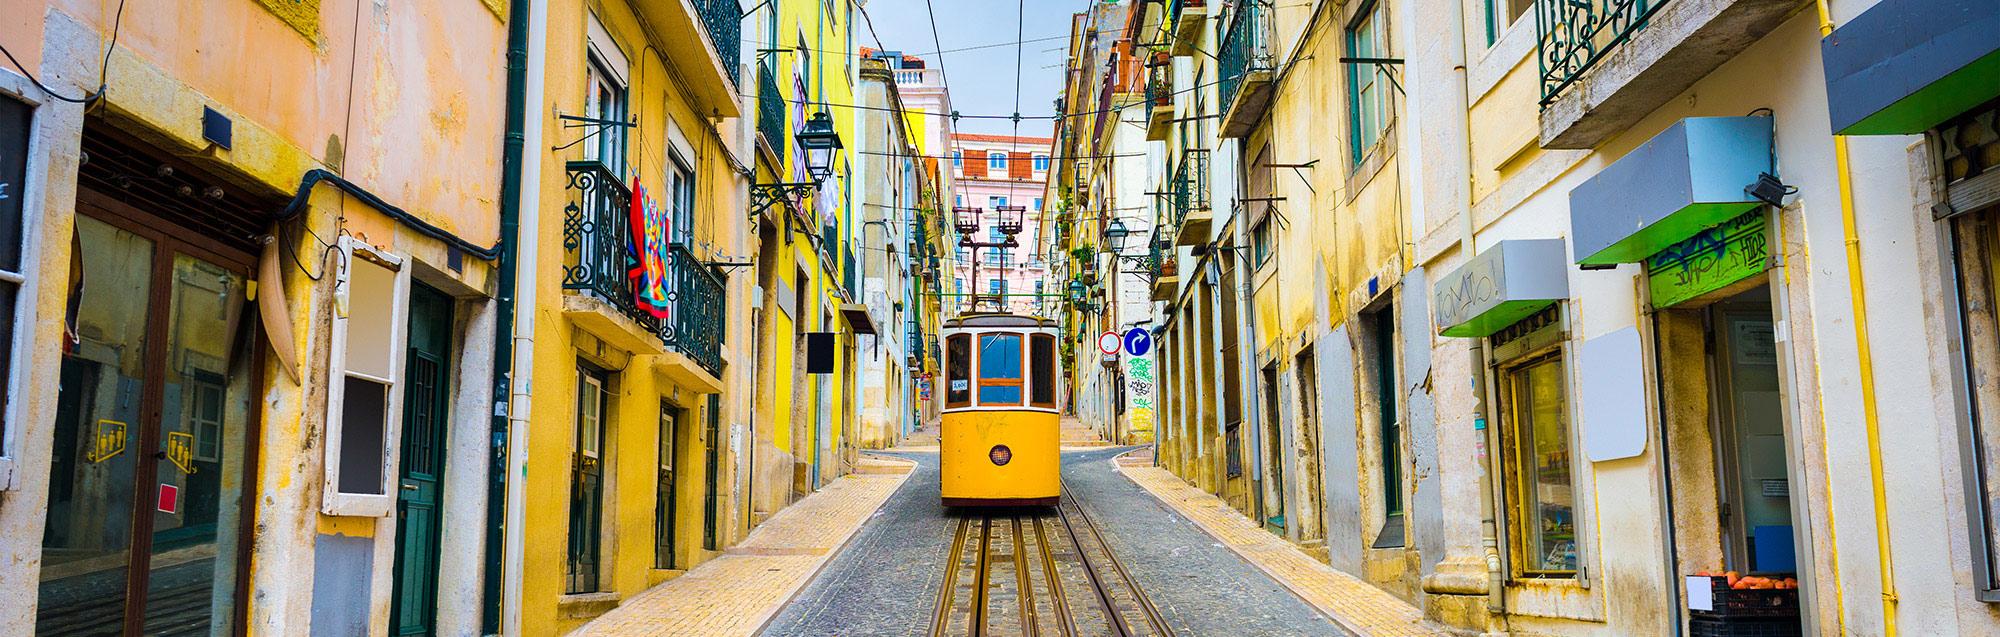 Tú curso de portugués 2019/2020